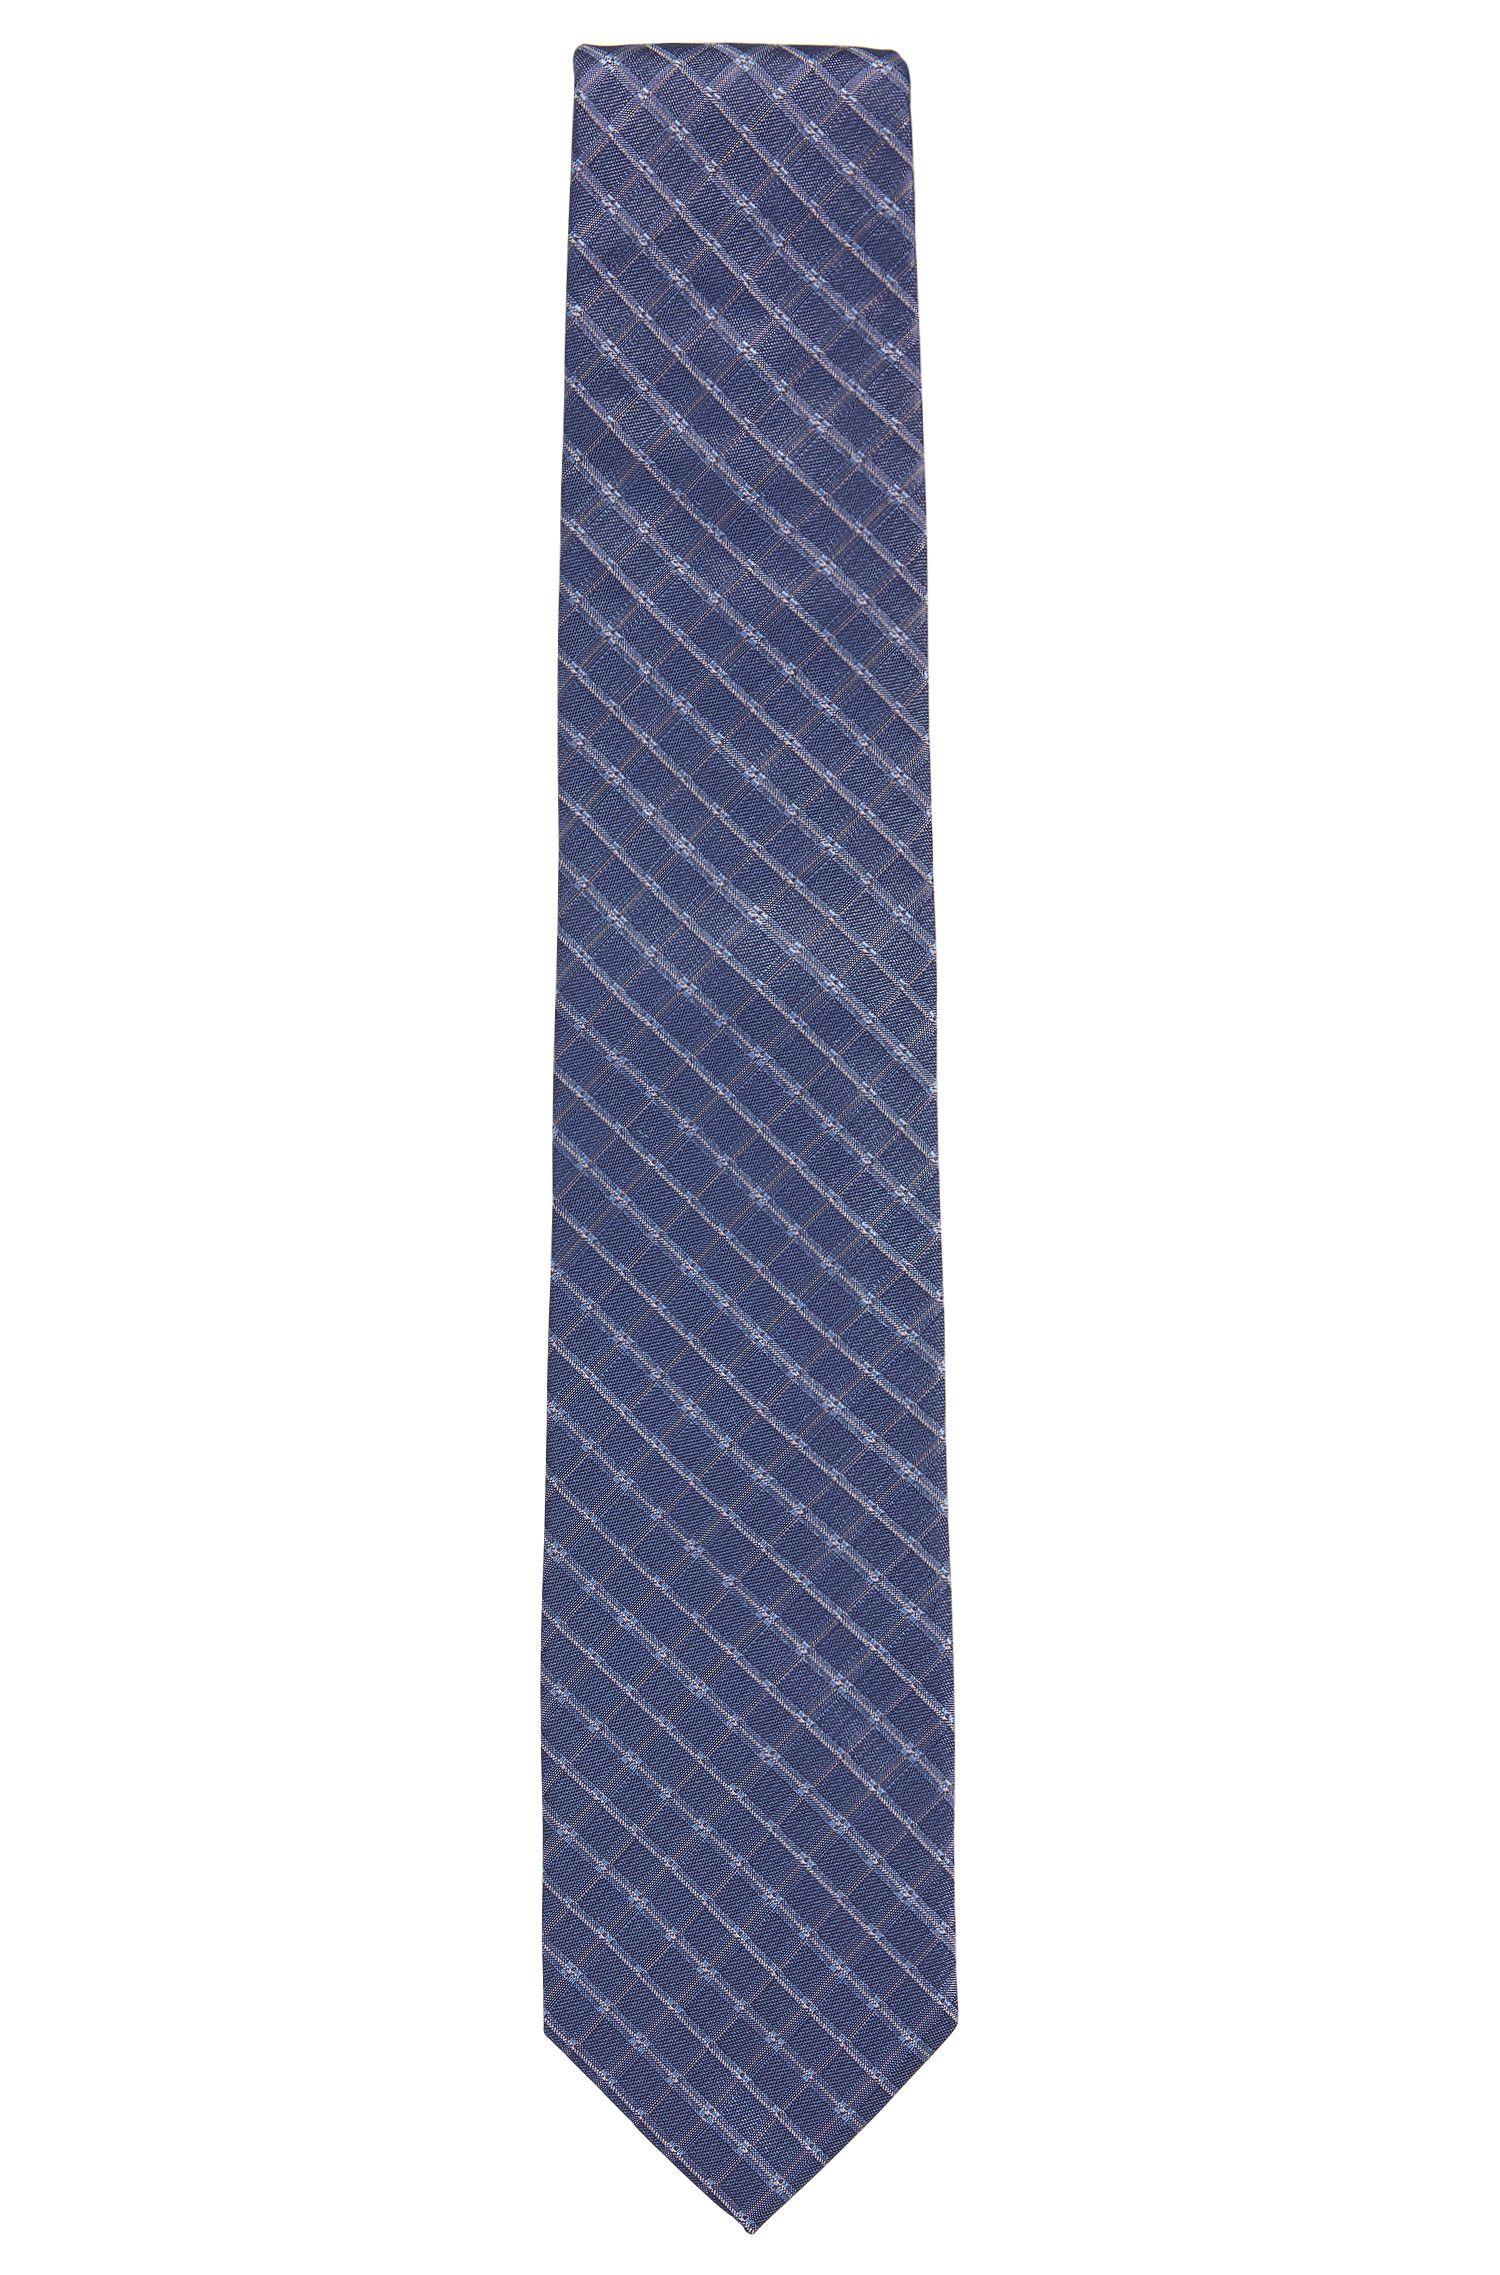 Checked Italian Silk Tie